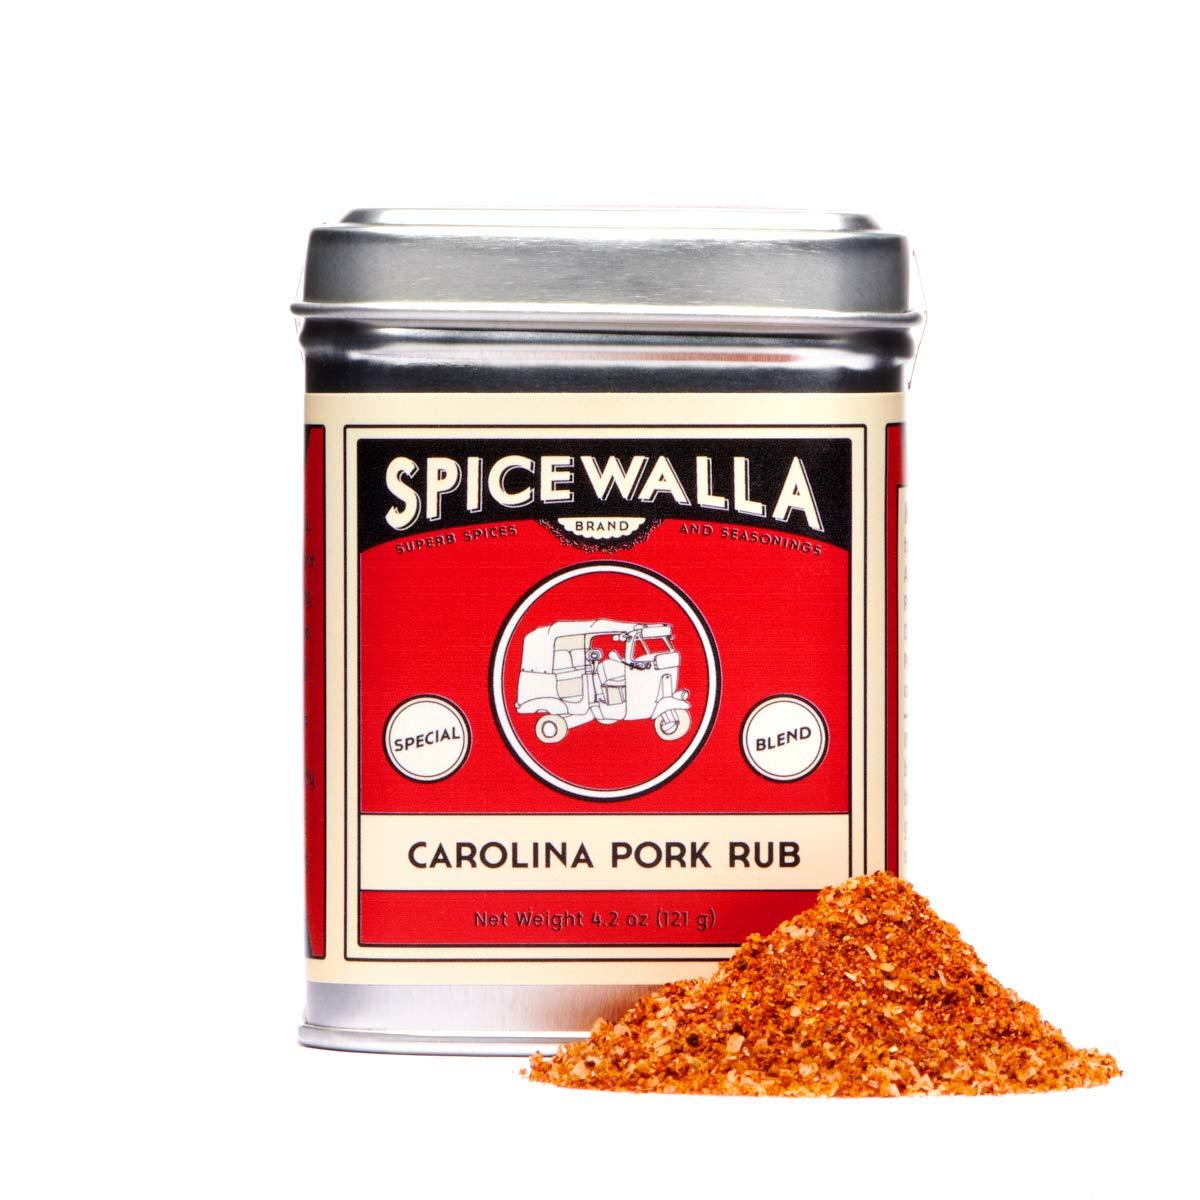 Spicewalla Carolina Pork Rub | BBQ Rub for Seasoning Ribs, Chicken, Beef, Vegetables | Barbecue, Grilling, Roast, Slow Cooker